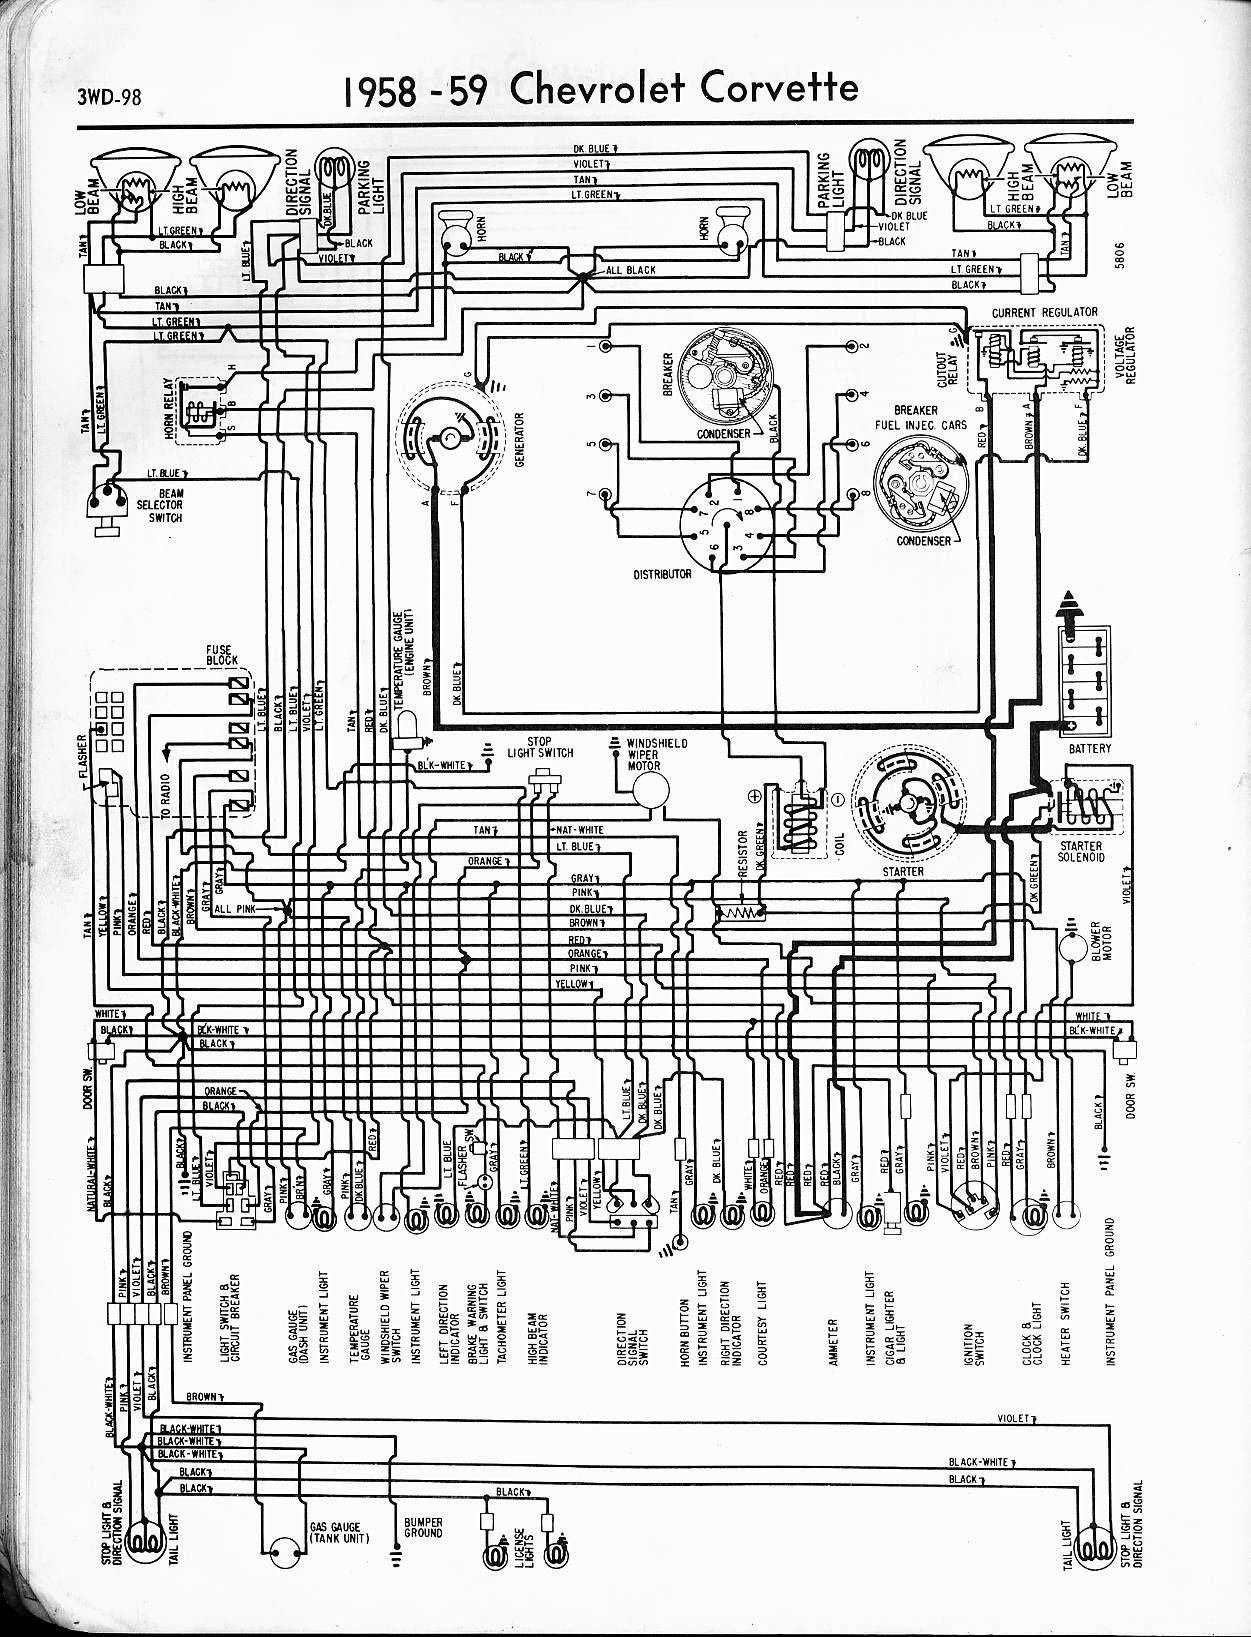 2002 Impala Wiring Diagram Chevrolet Chevy Sedan 1964 Chevy Impala on 1964 impala alternator wiring diagram, 1964 impala engine wiring diagram, 1964 impala tail light wiring diagram,